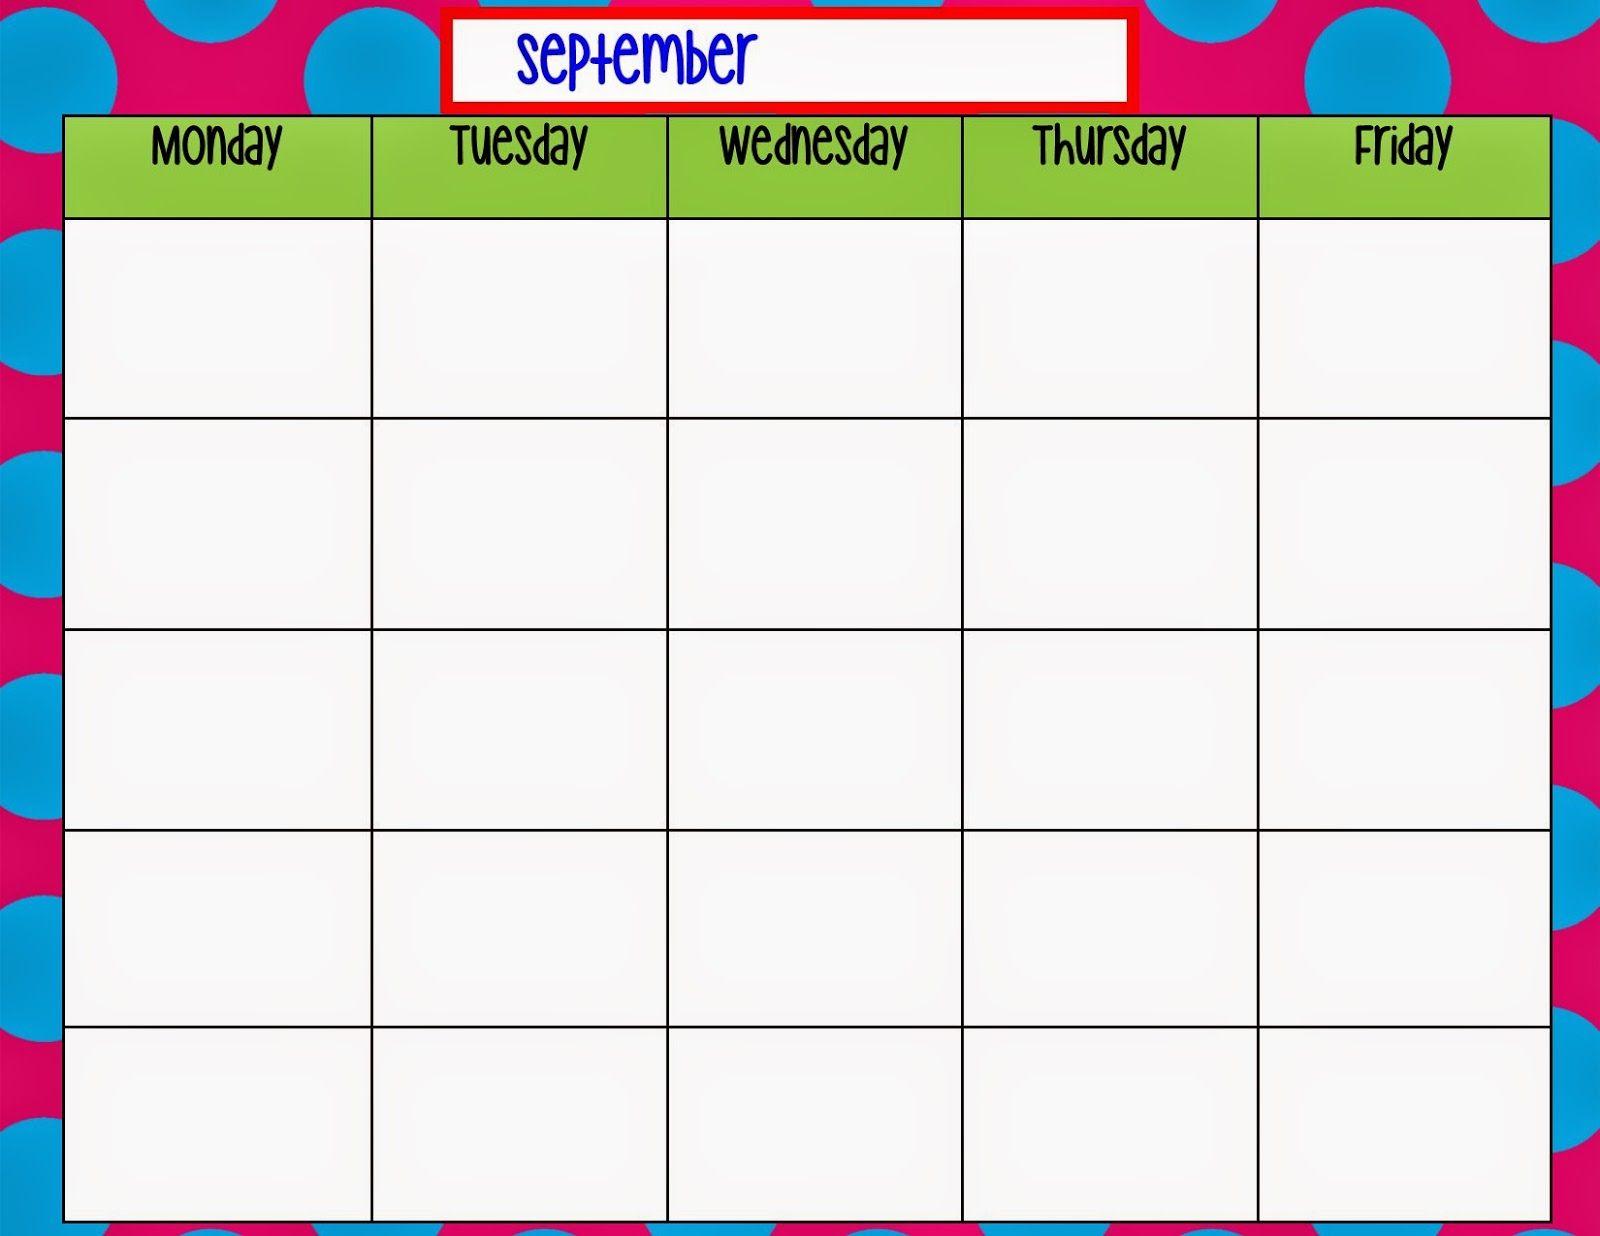 Monday Through Friday Calendar Template | Preschool | Weekly pertaining to Blank Calendar Chart For Classrooms